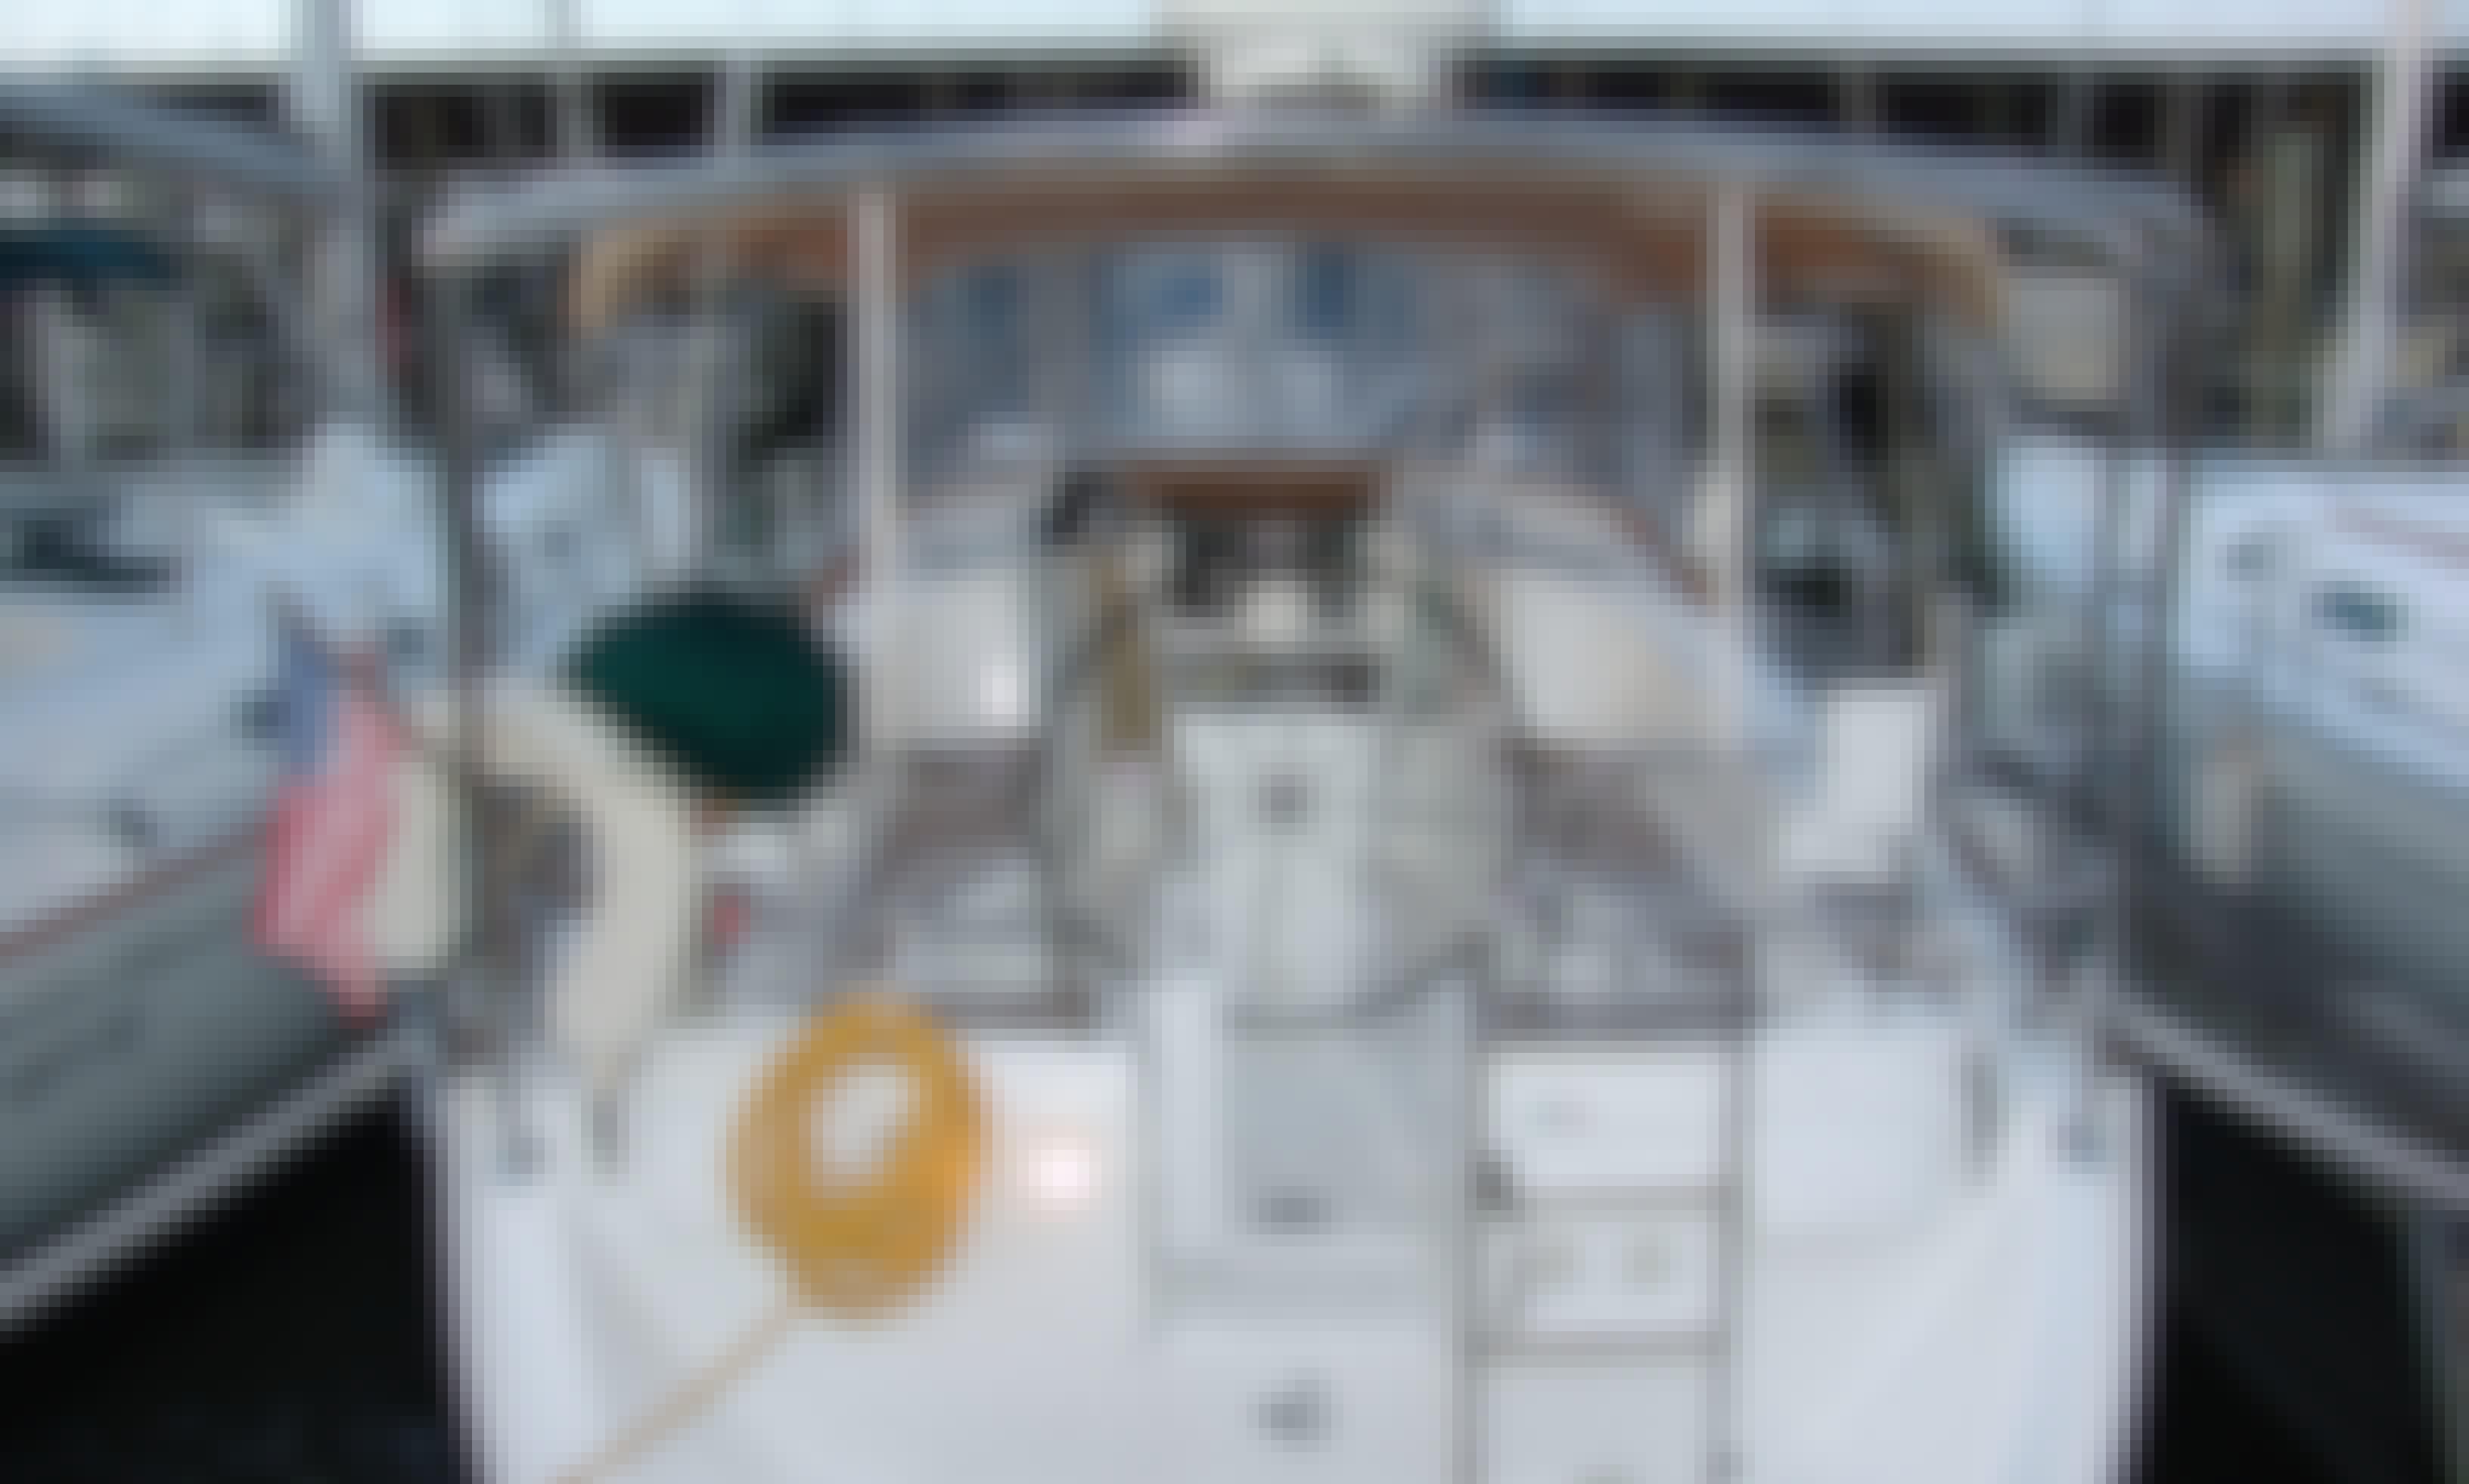 Classic Beneteau 423 Sailboat for Bristol & Beyond Sail